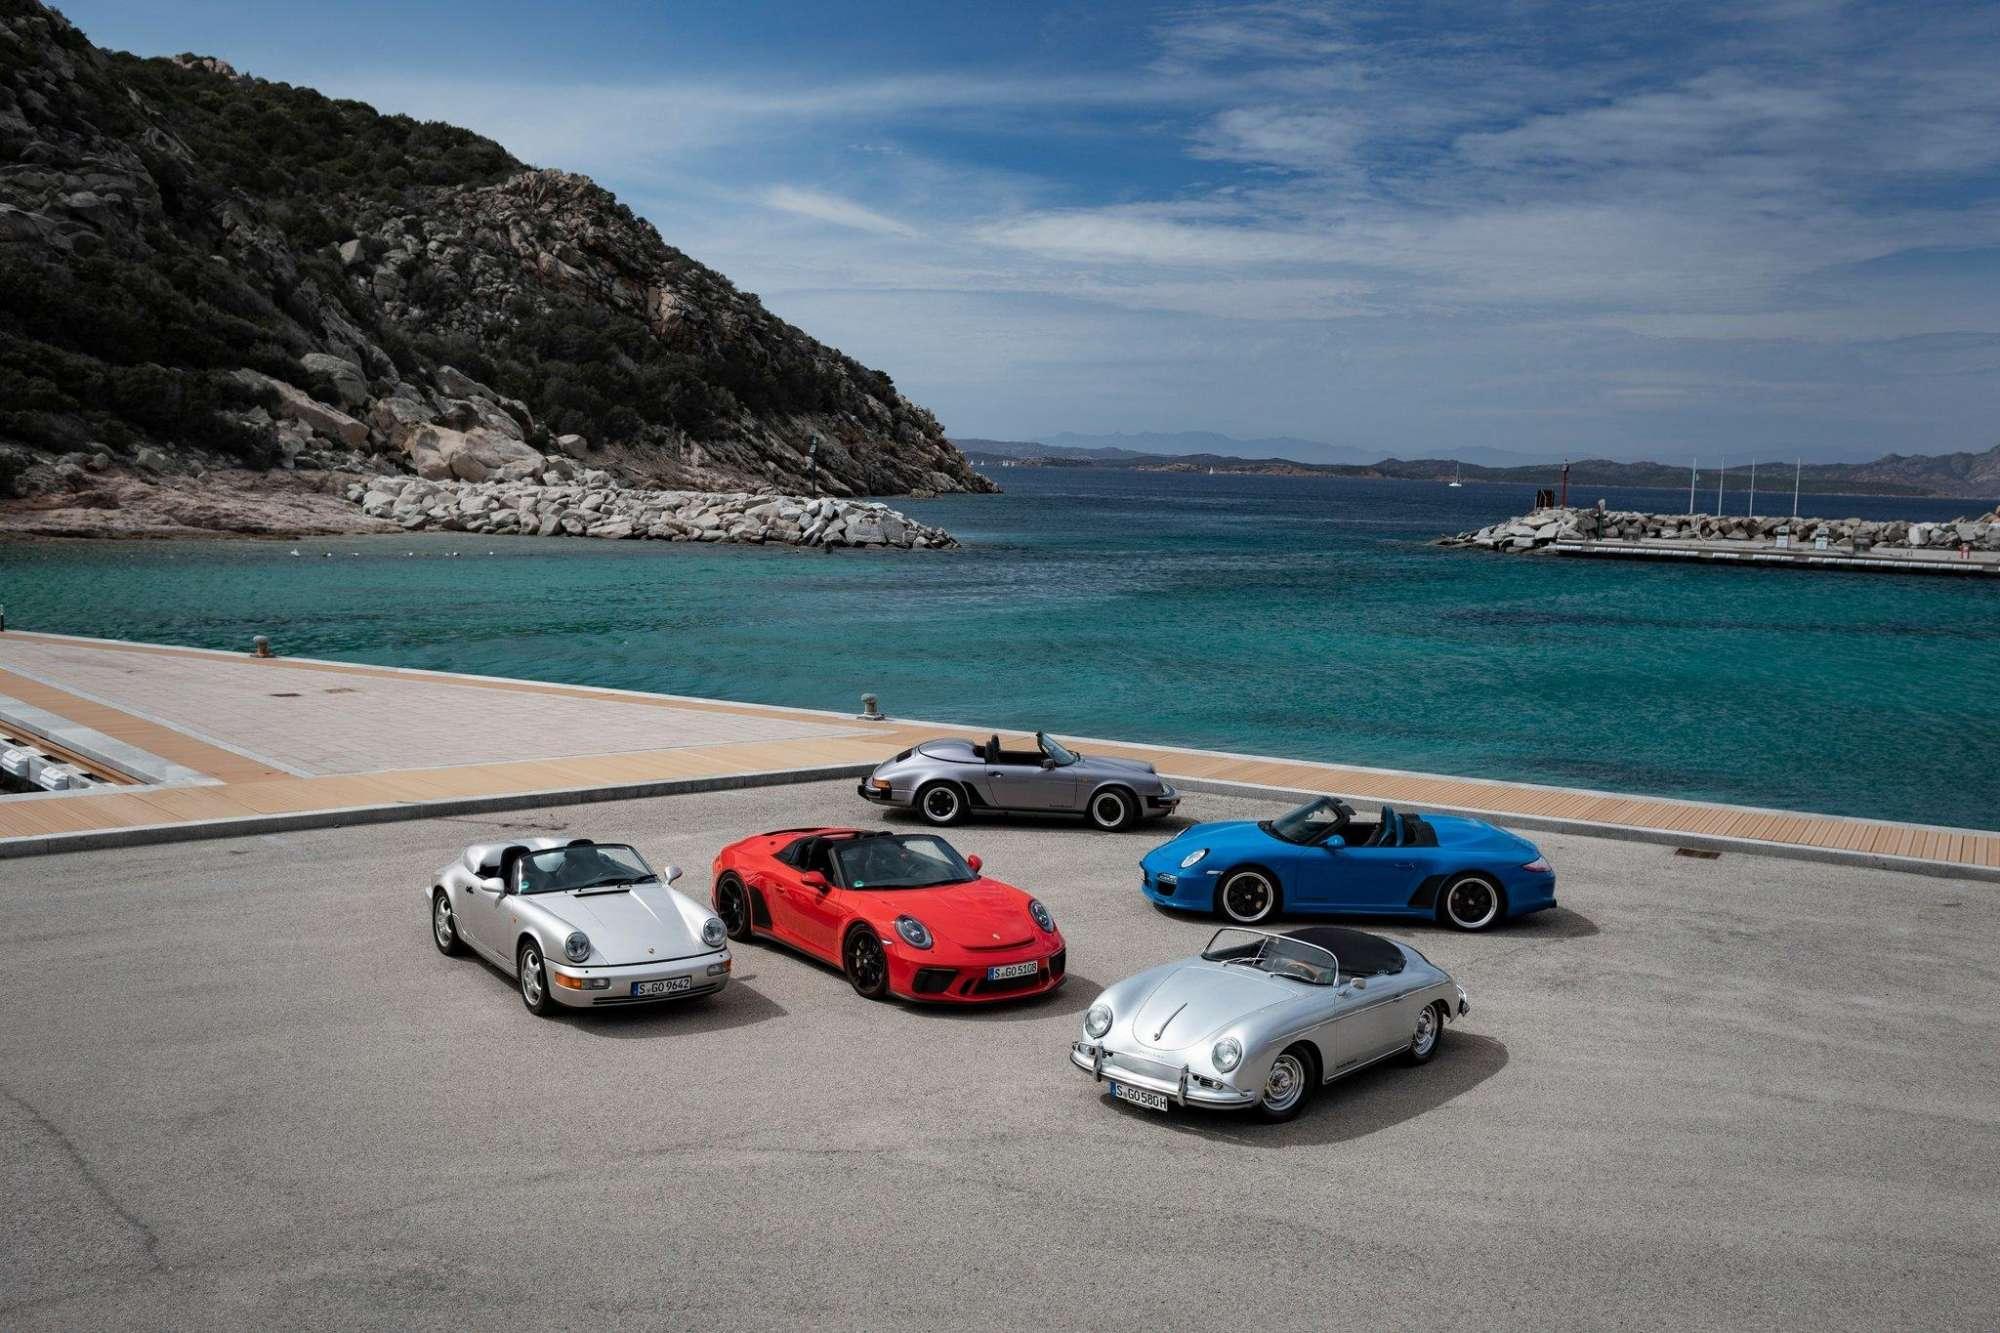 The history of the Porsche Speedster